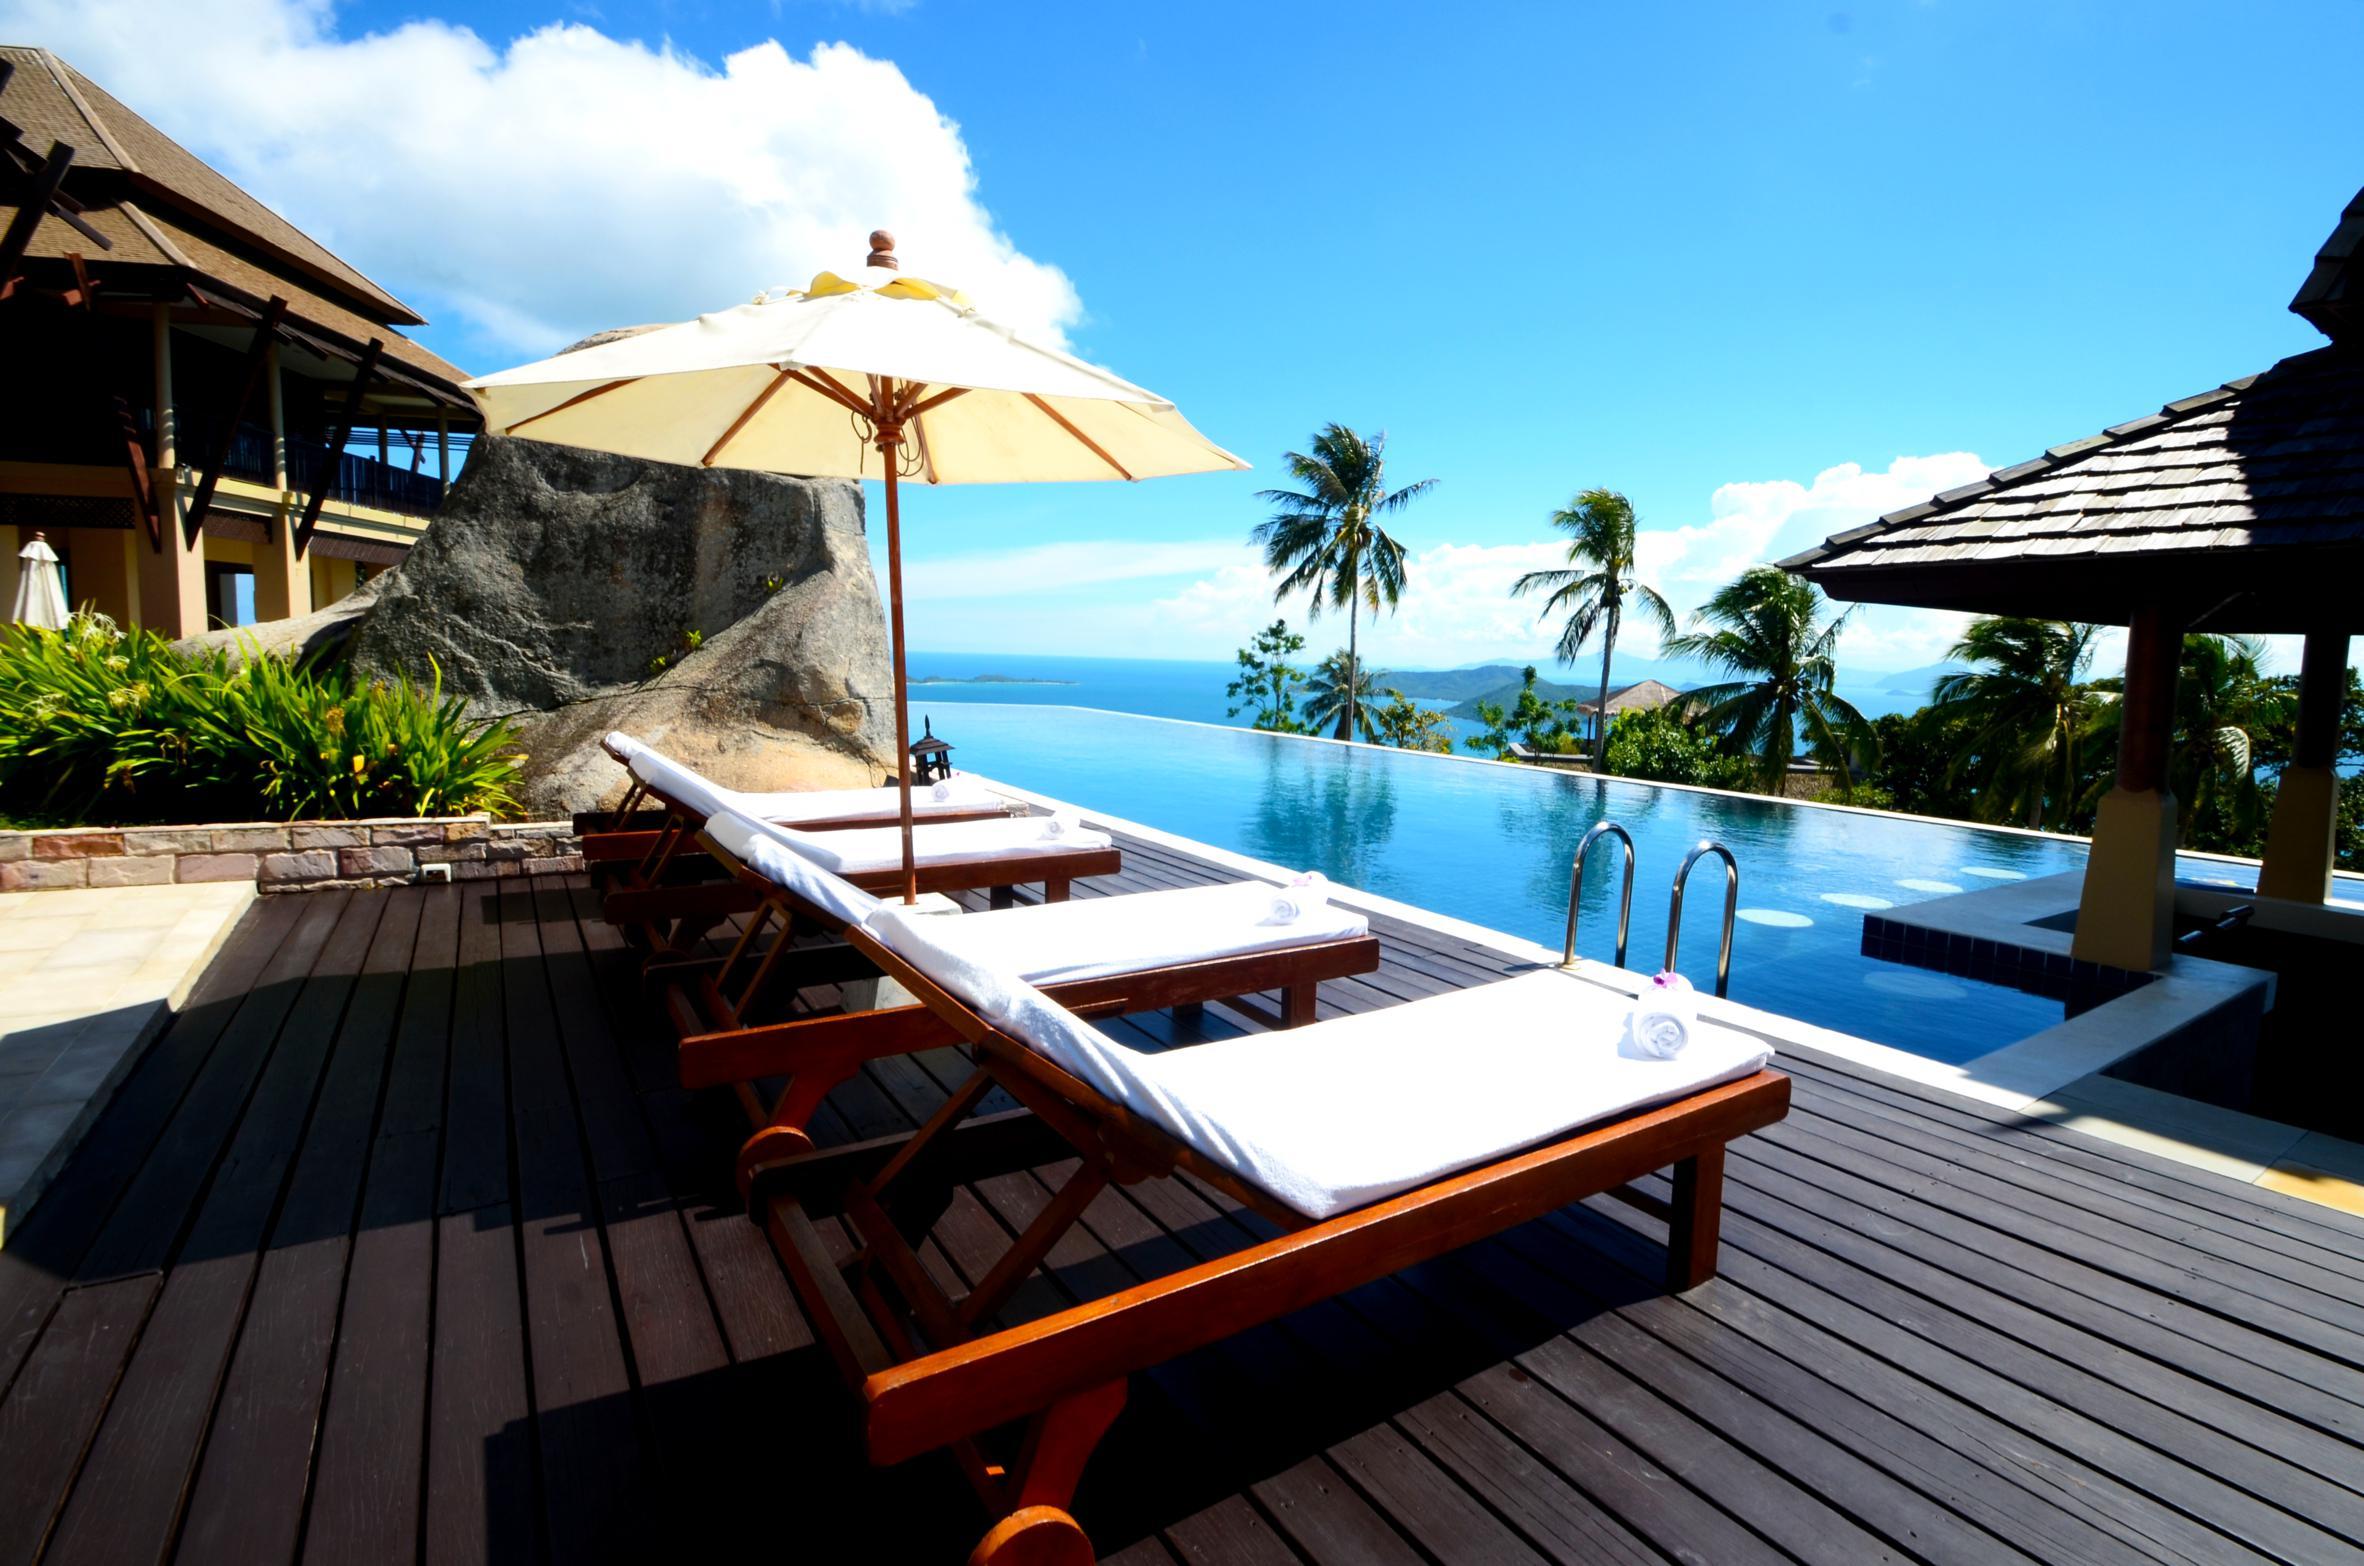 Luxury Sea View Villa For Sale Koh Samui by Thai Real com